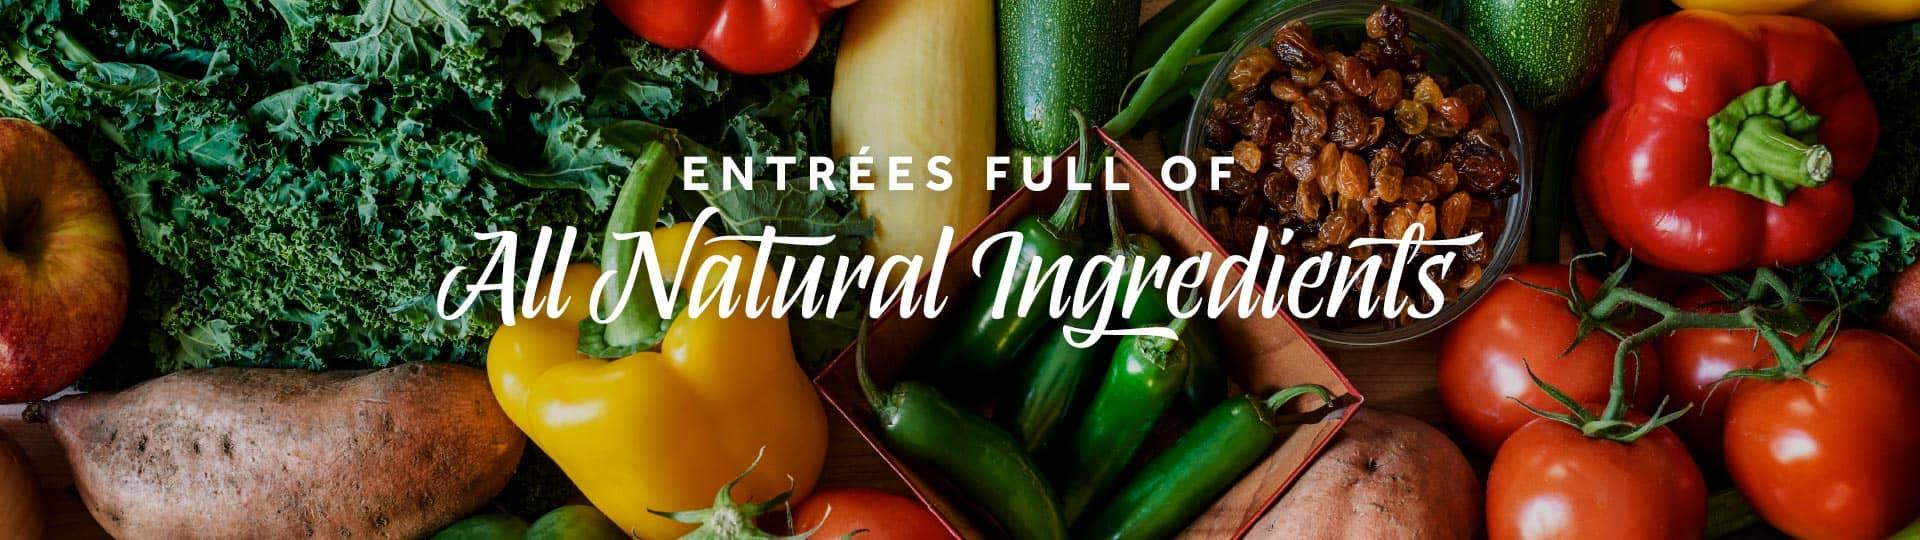 Entrées Full of All Natural Ingredients